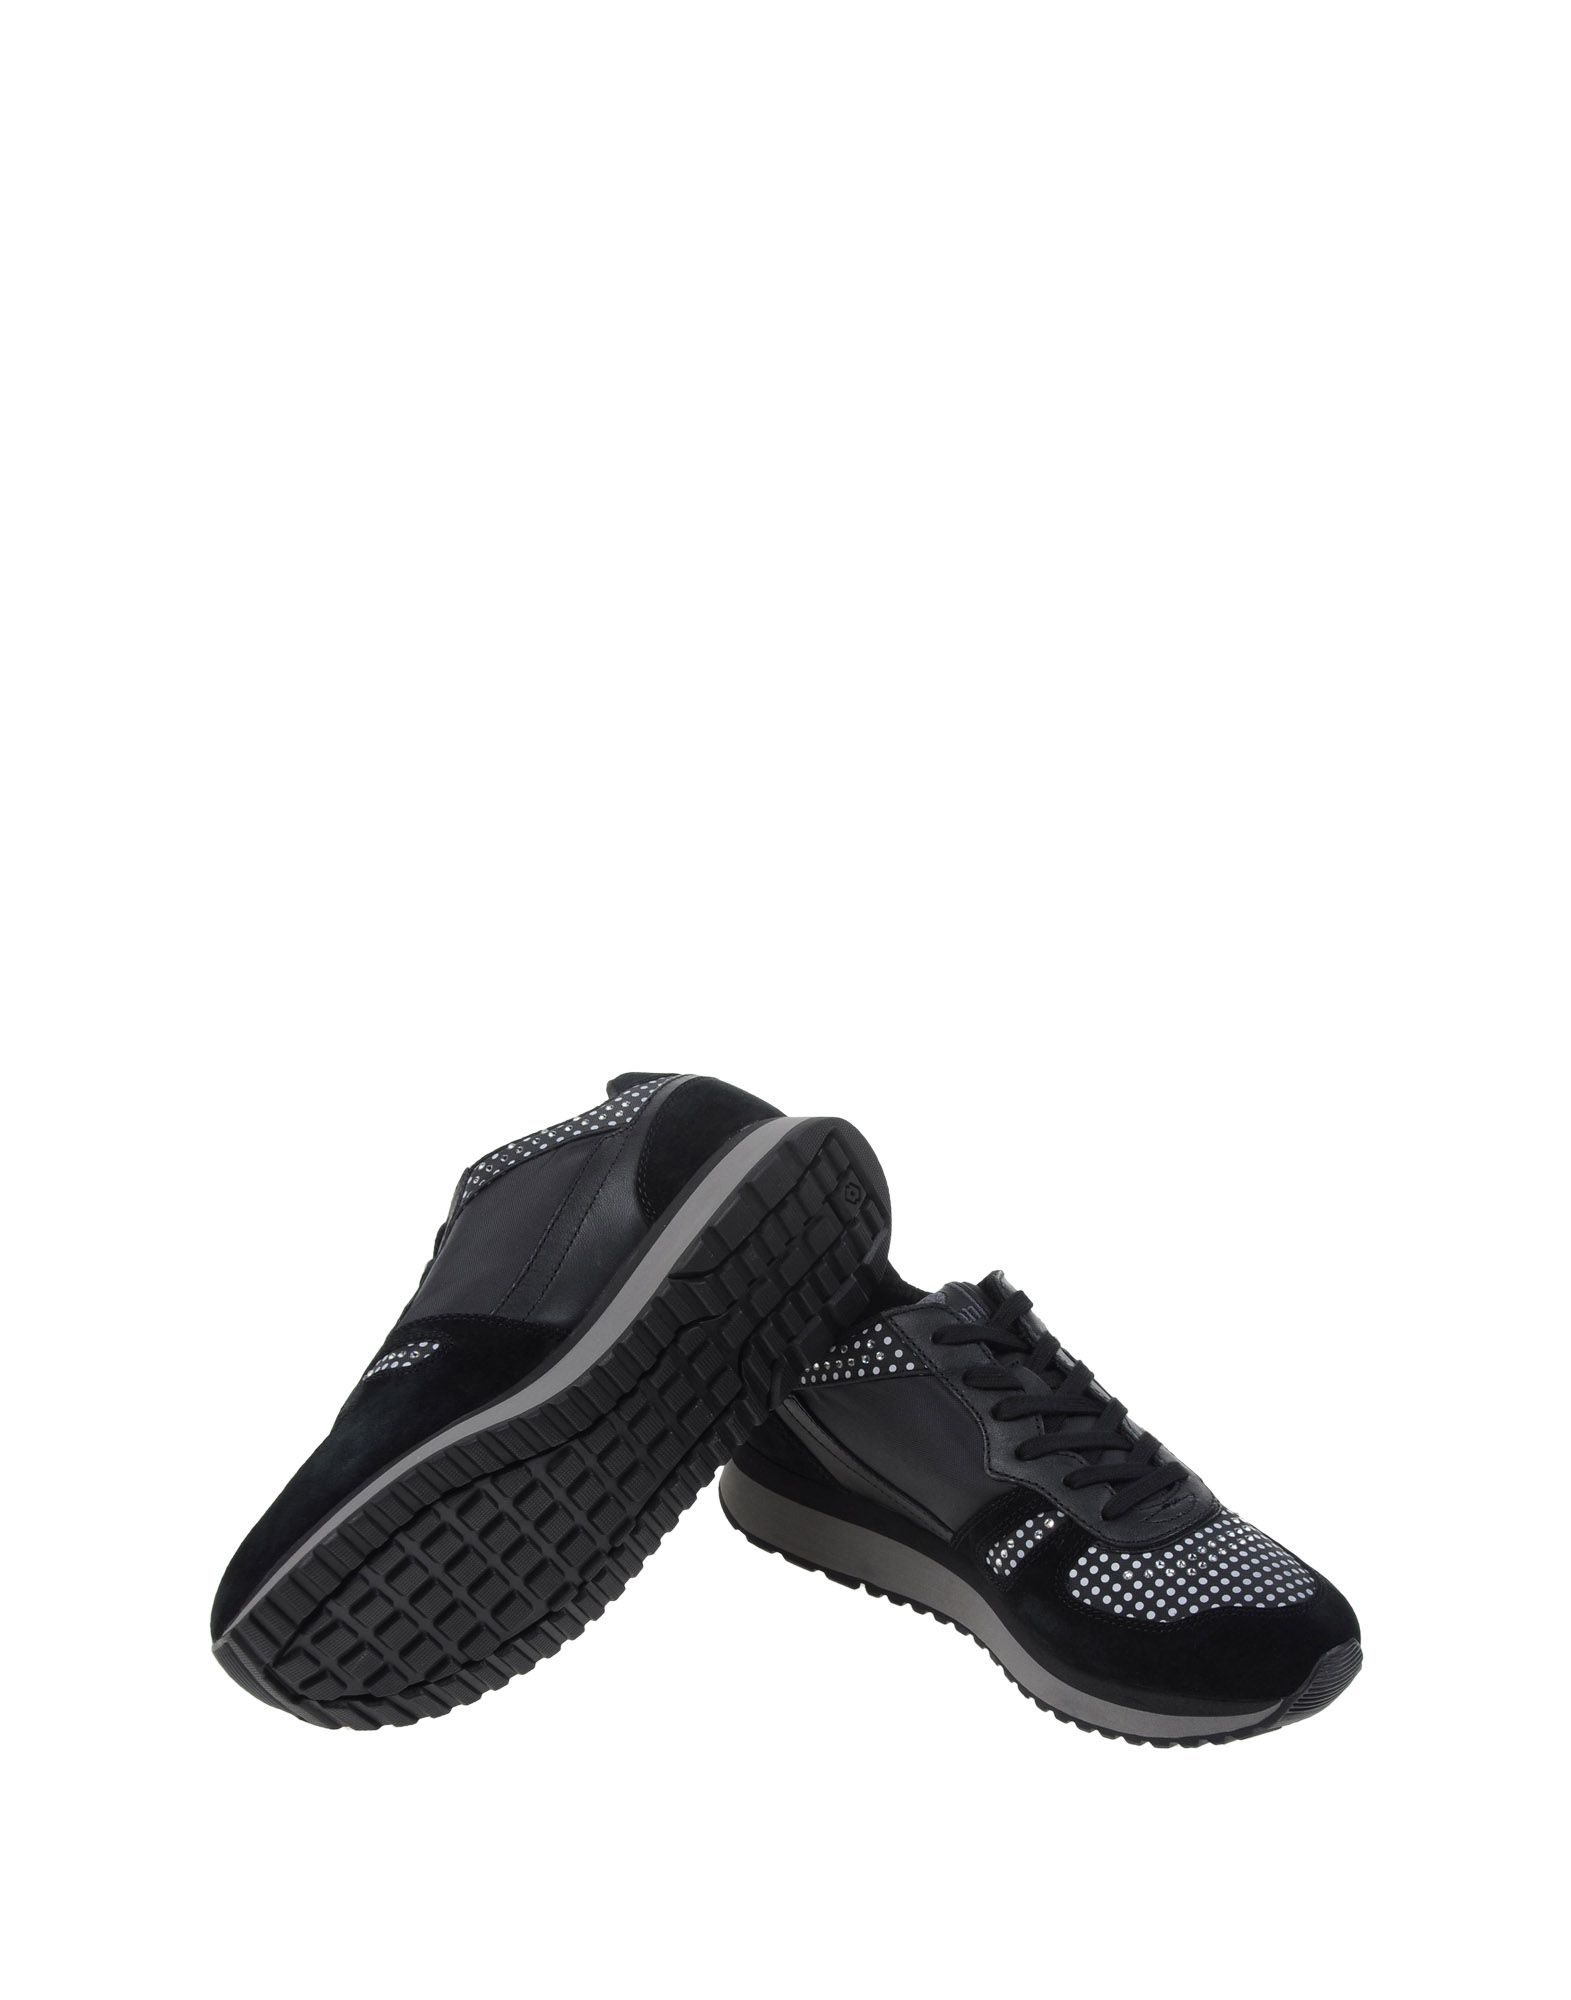 Sneakers Lotto Leggenda  Tokyo - Wedge W - Donna - Tokyo 11118561KF 72ccc5